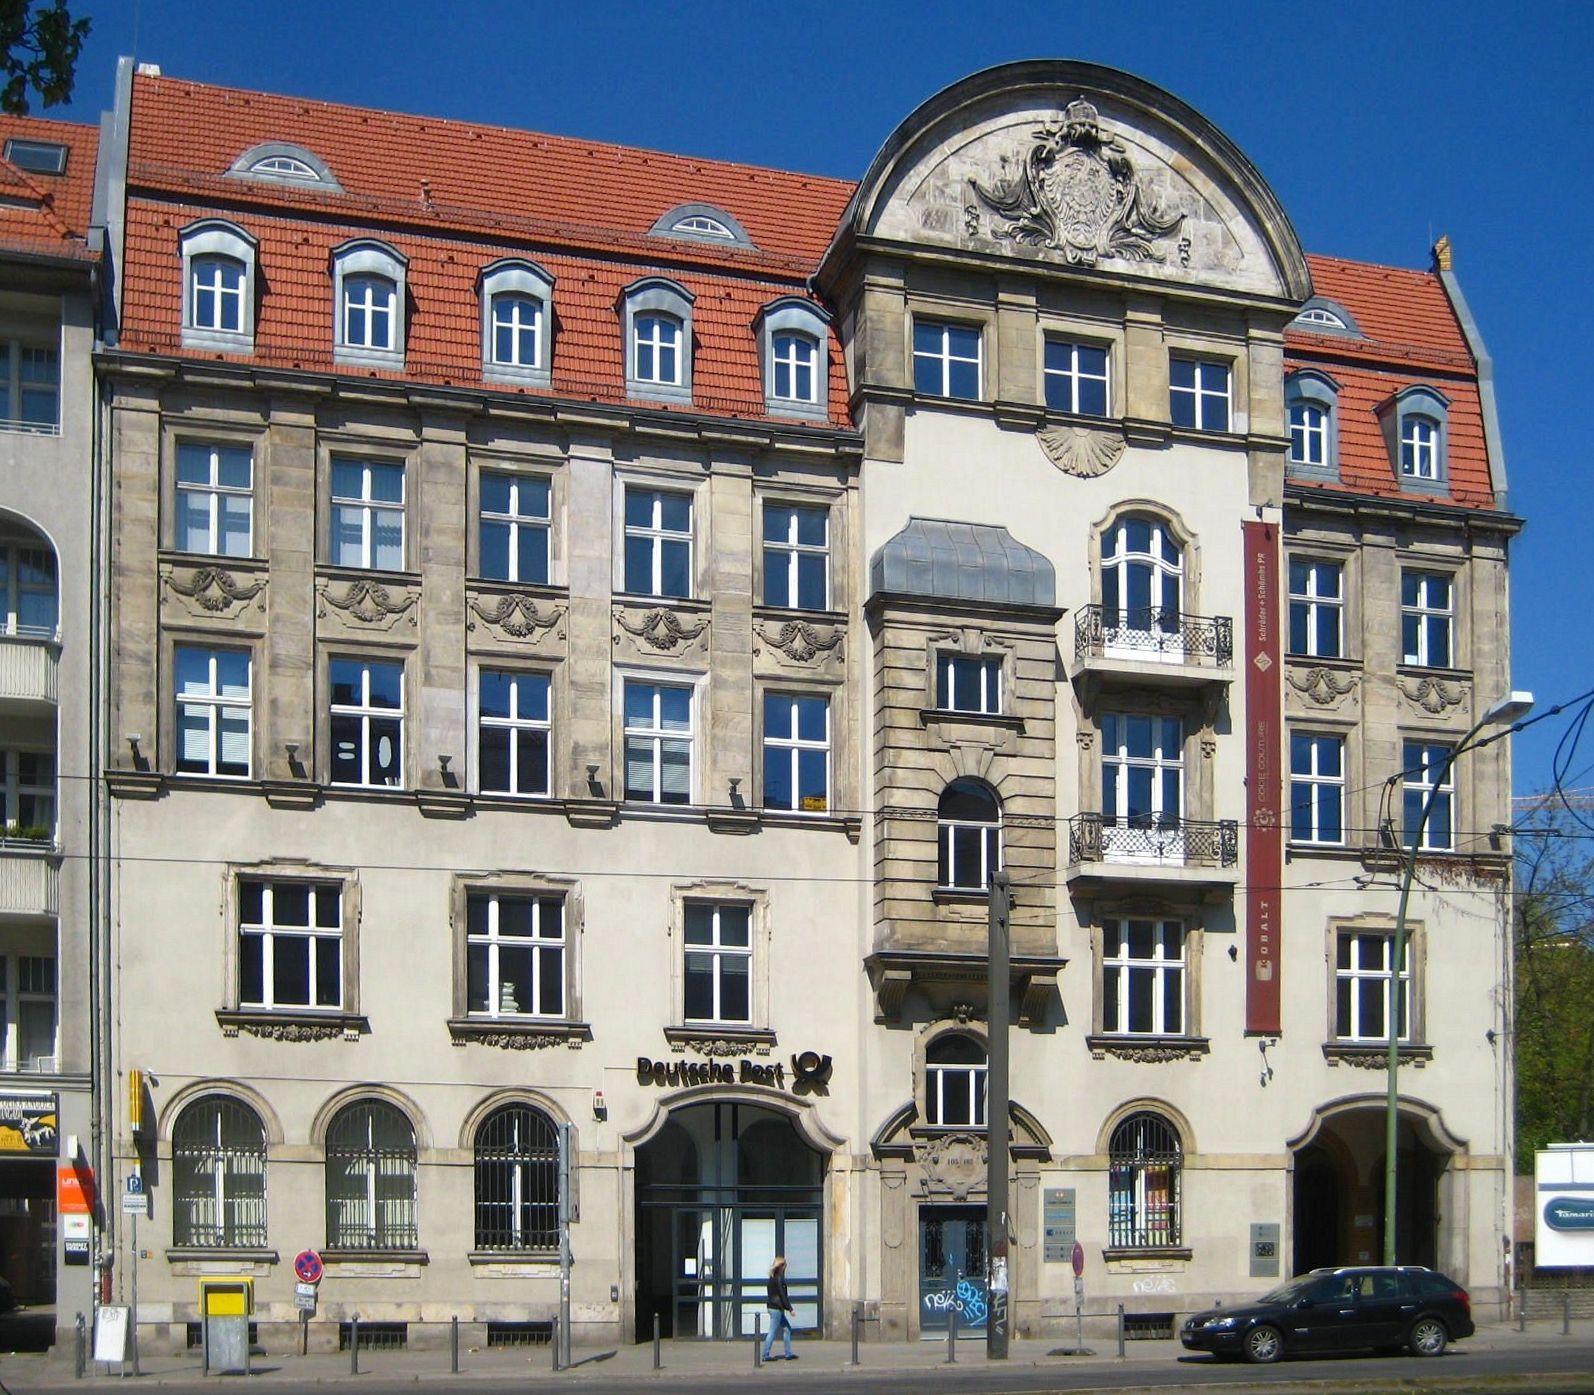 Berlin Postcode